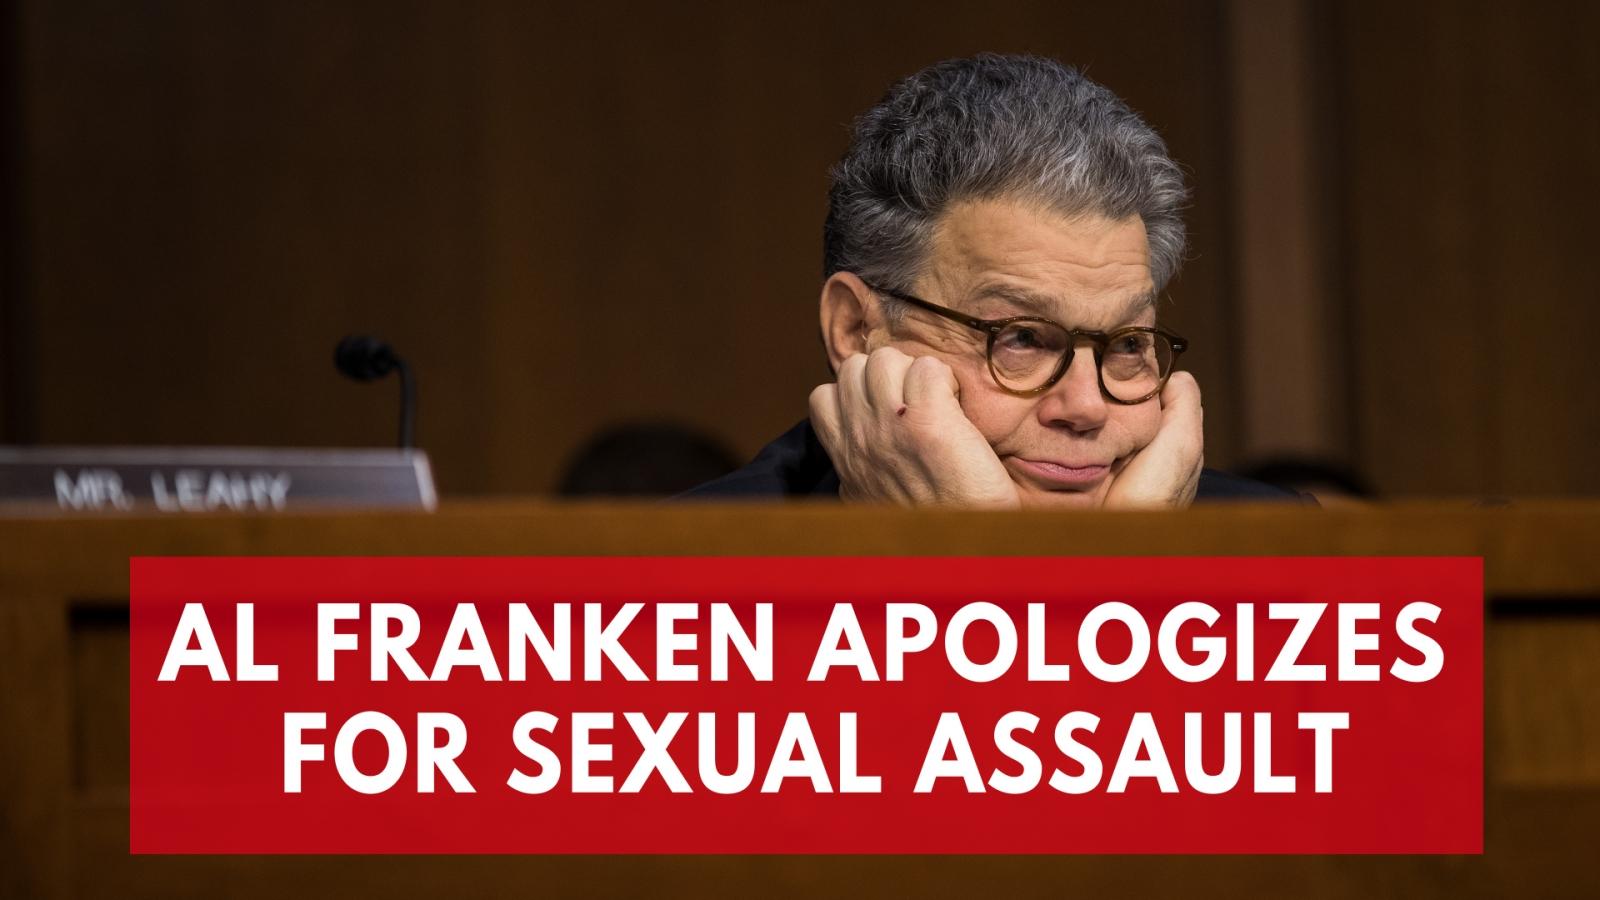 senator-al-franken-apologizes-following-sexual-assault-accusations-from-los-angeles-radio-hostleeann-tweeden